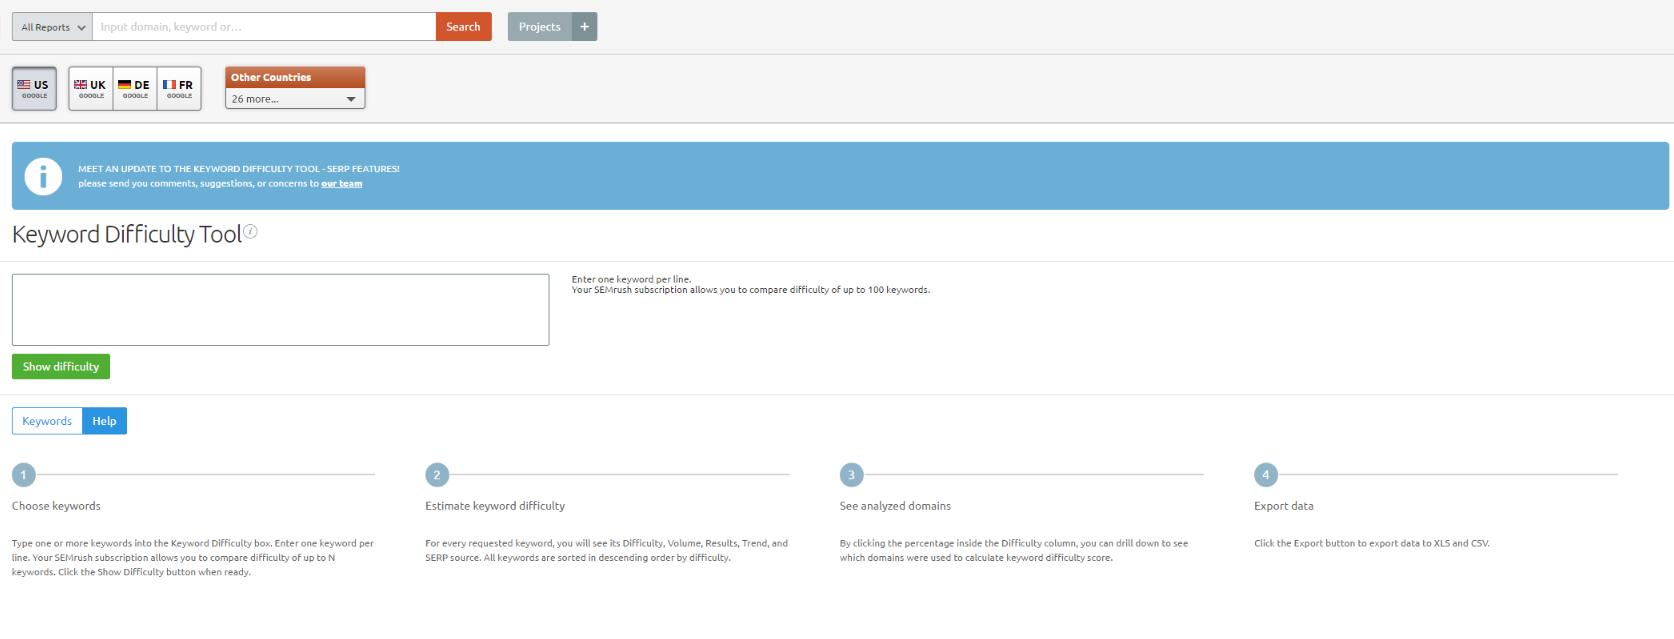 SEO keyword research tips: SEMRush's keyword difficulty tool